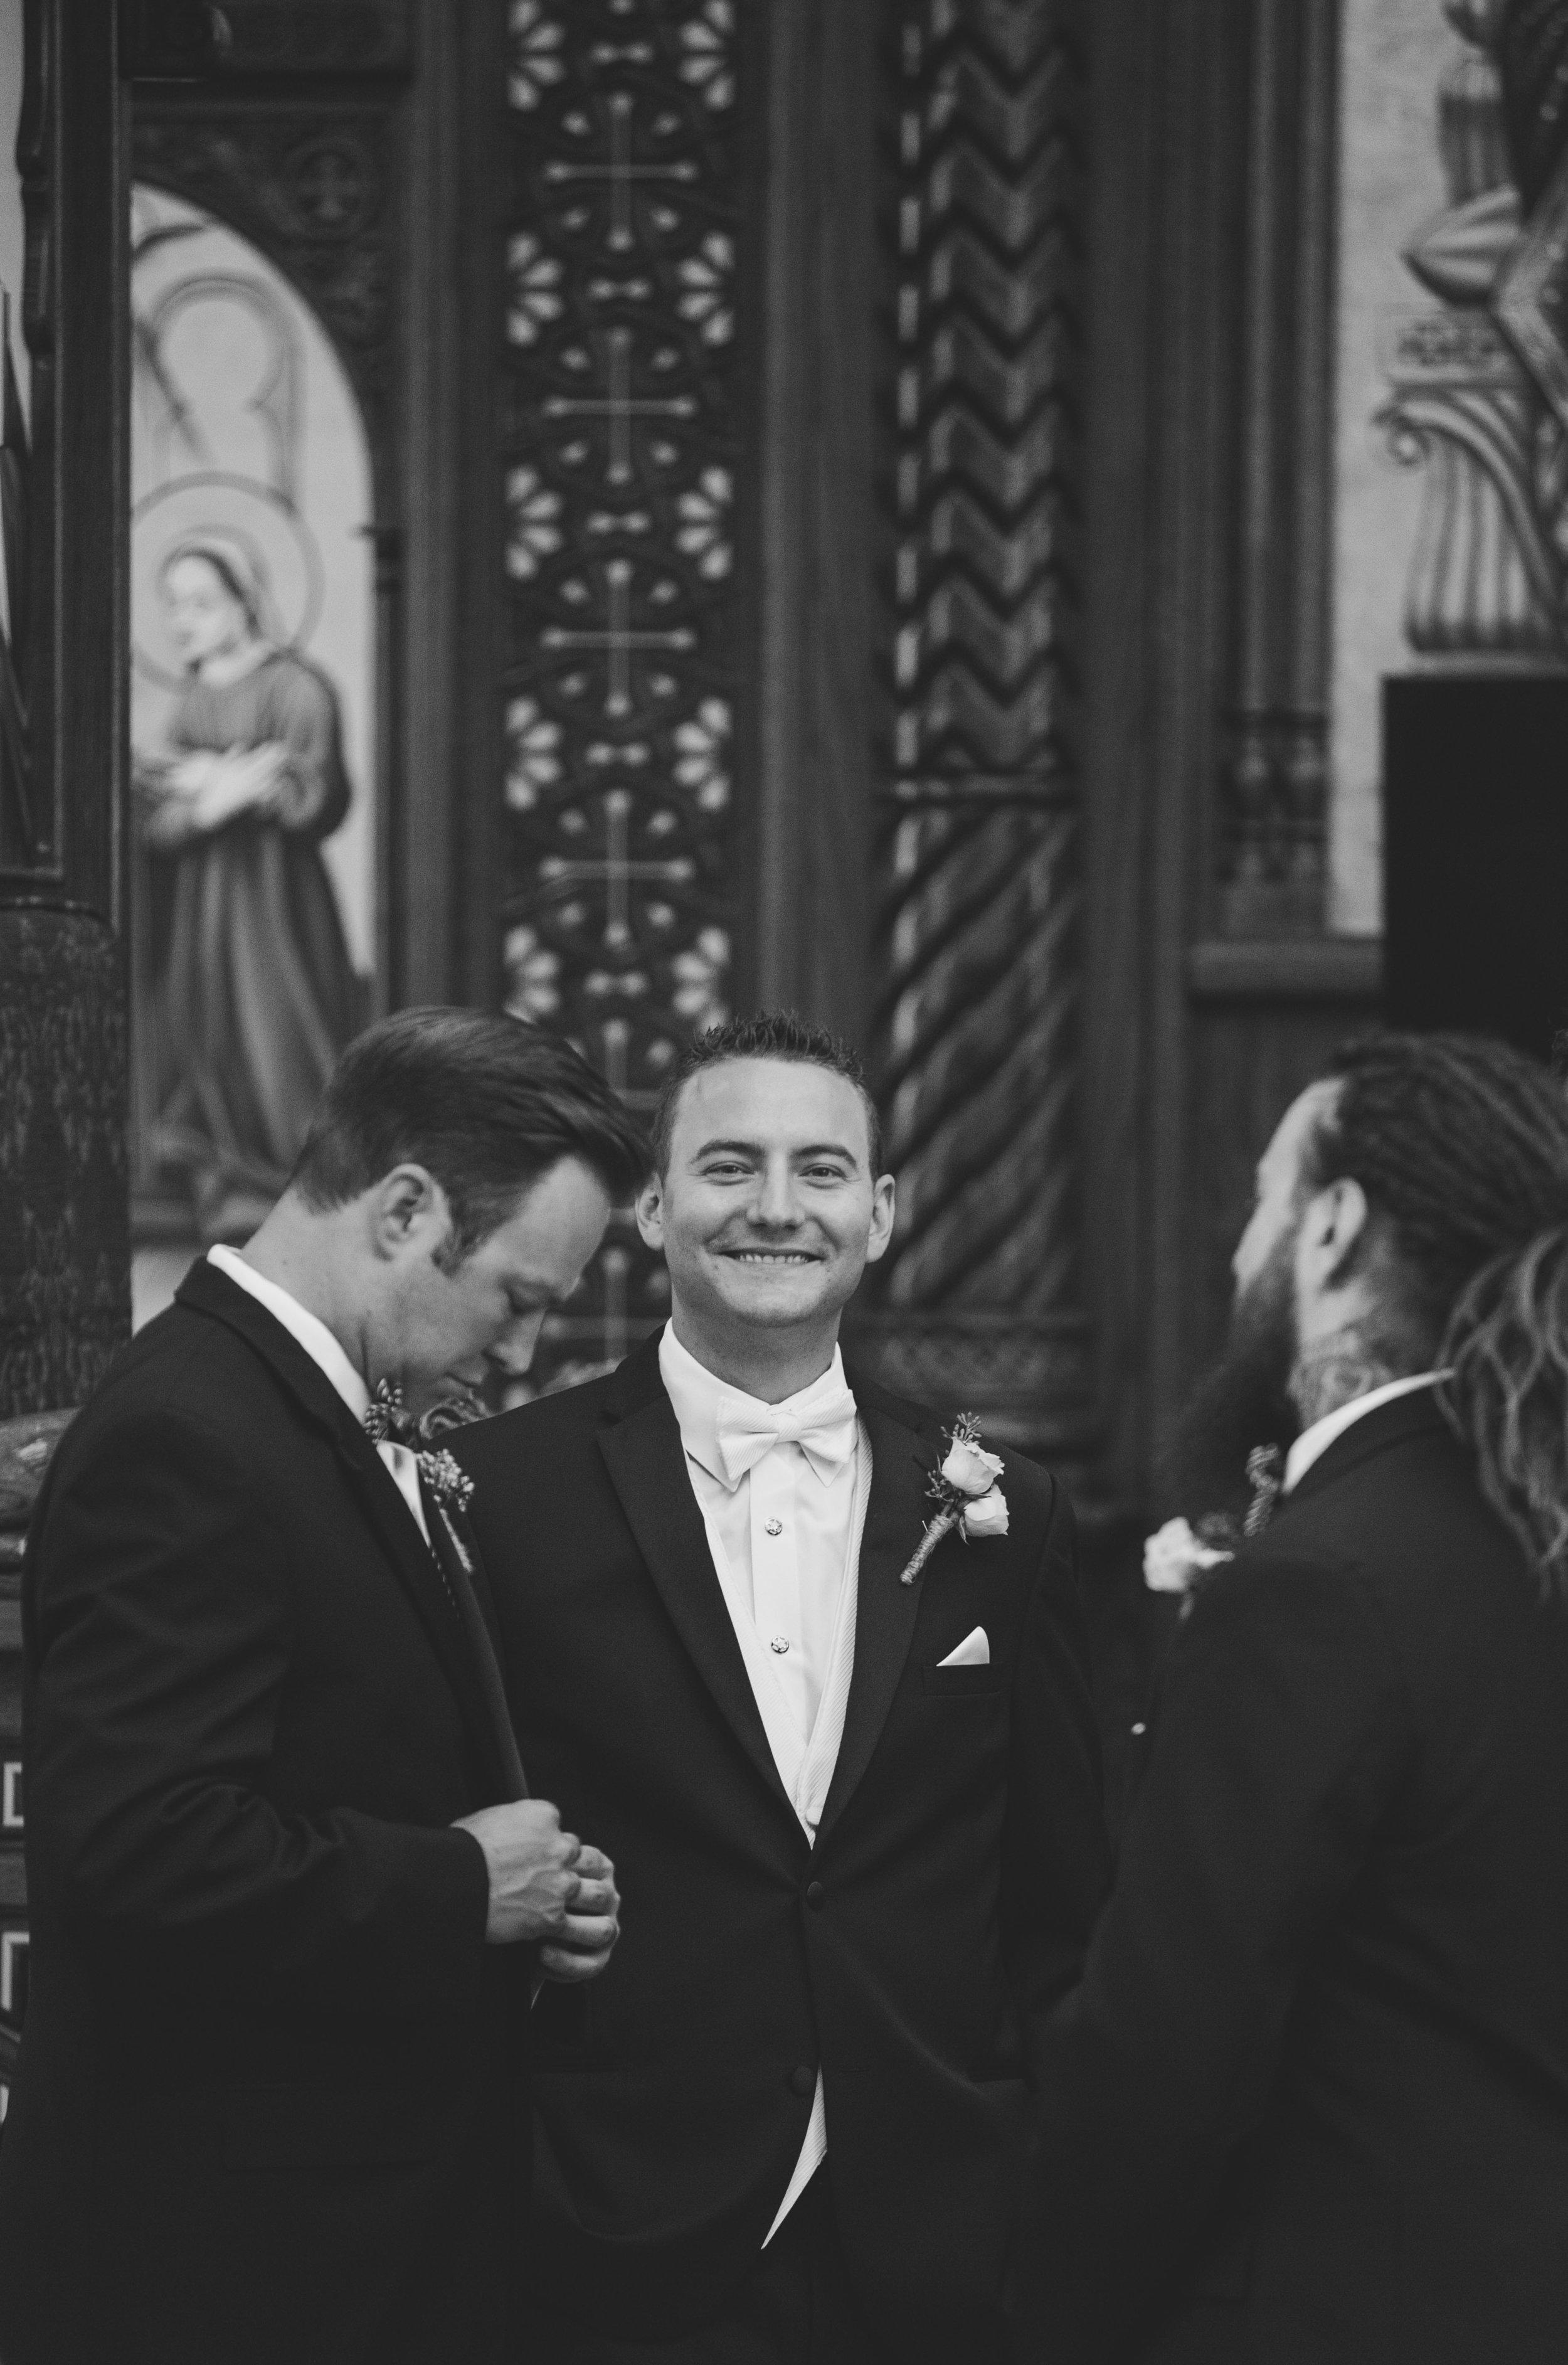 ATGI_Magali & Josh Wedding_2S8A0408.jpg